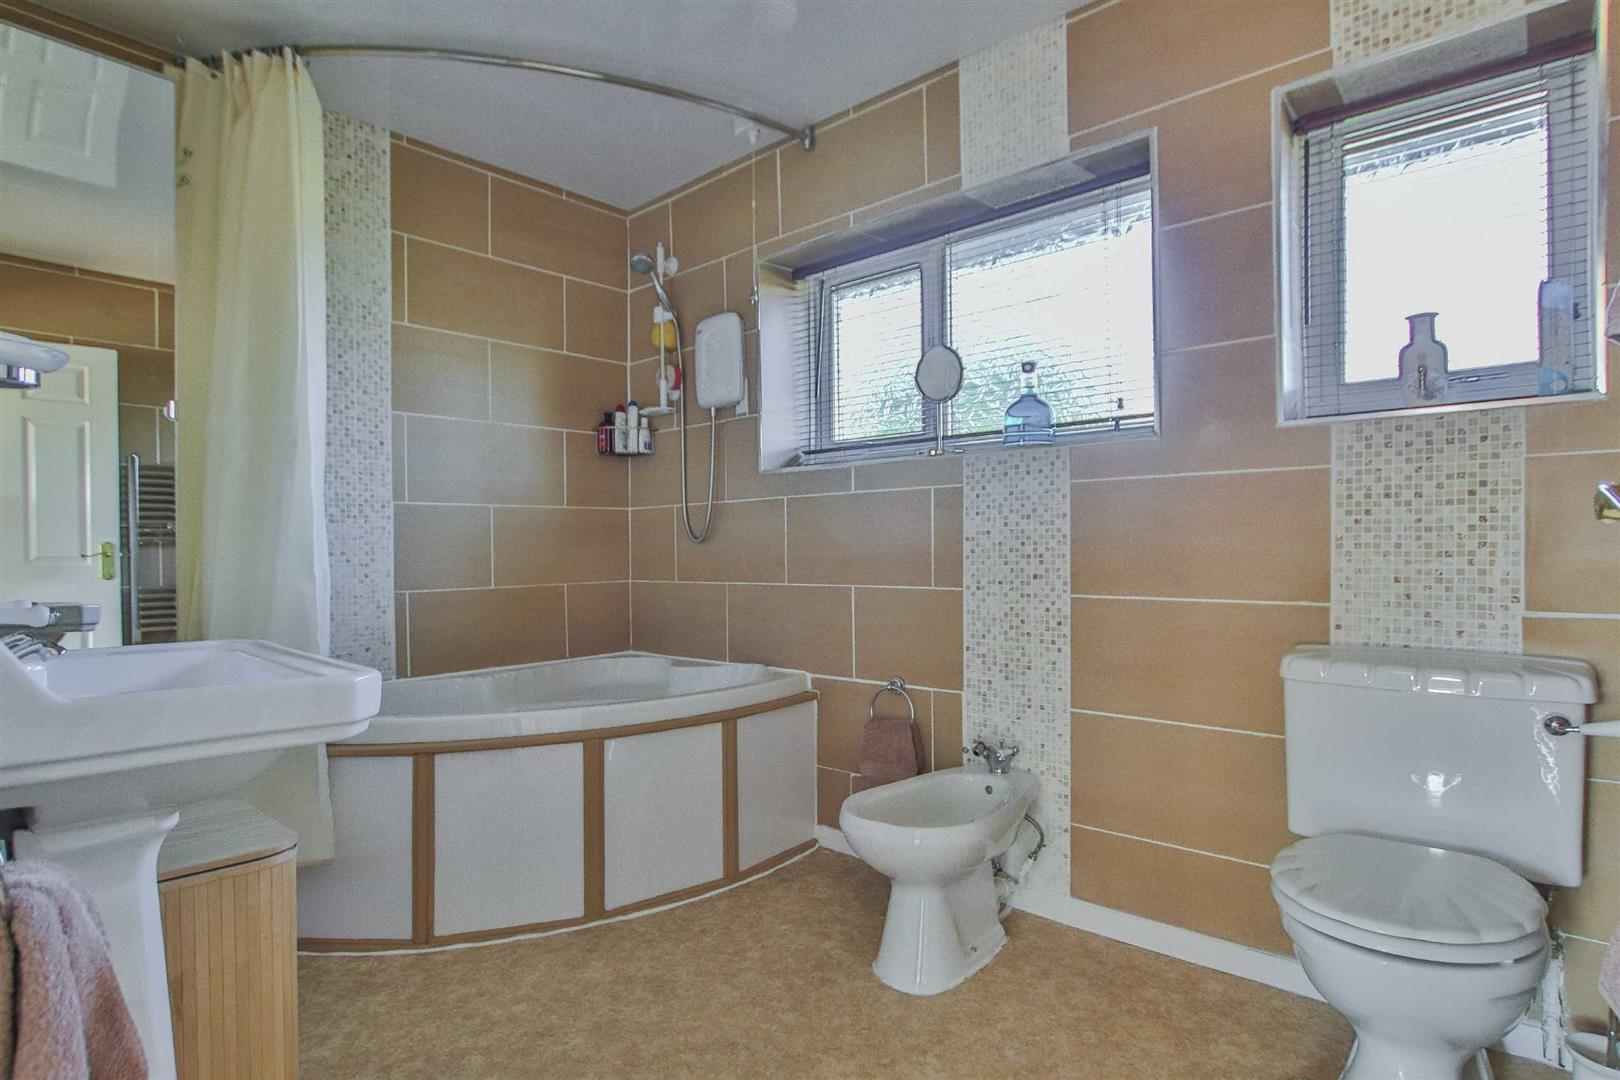 4 Bedroom Detached House For Sale - Image 15